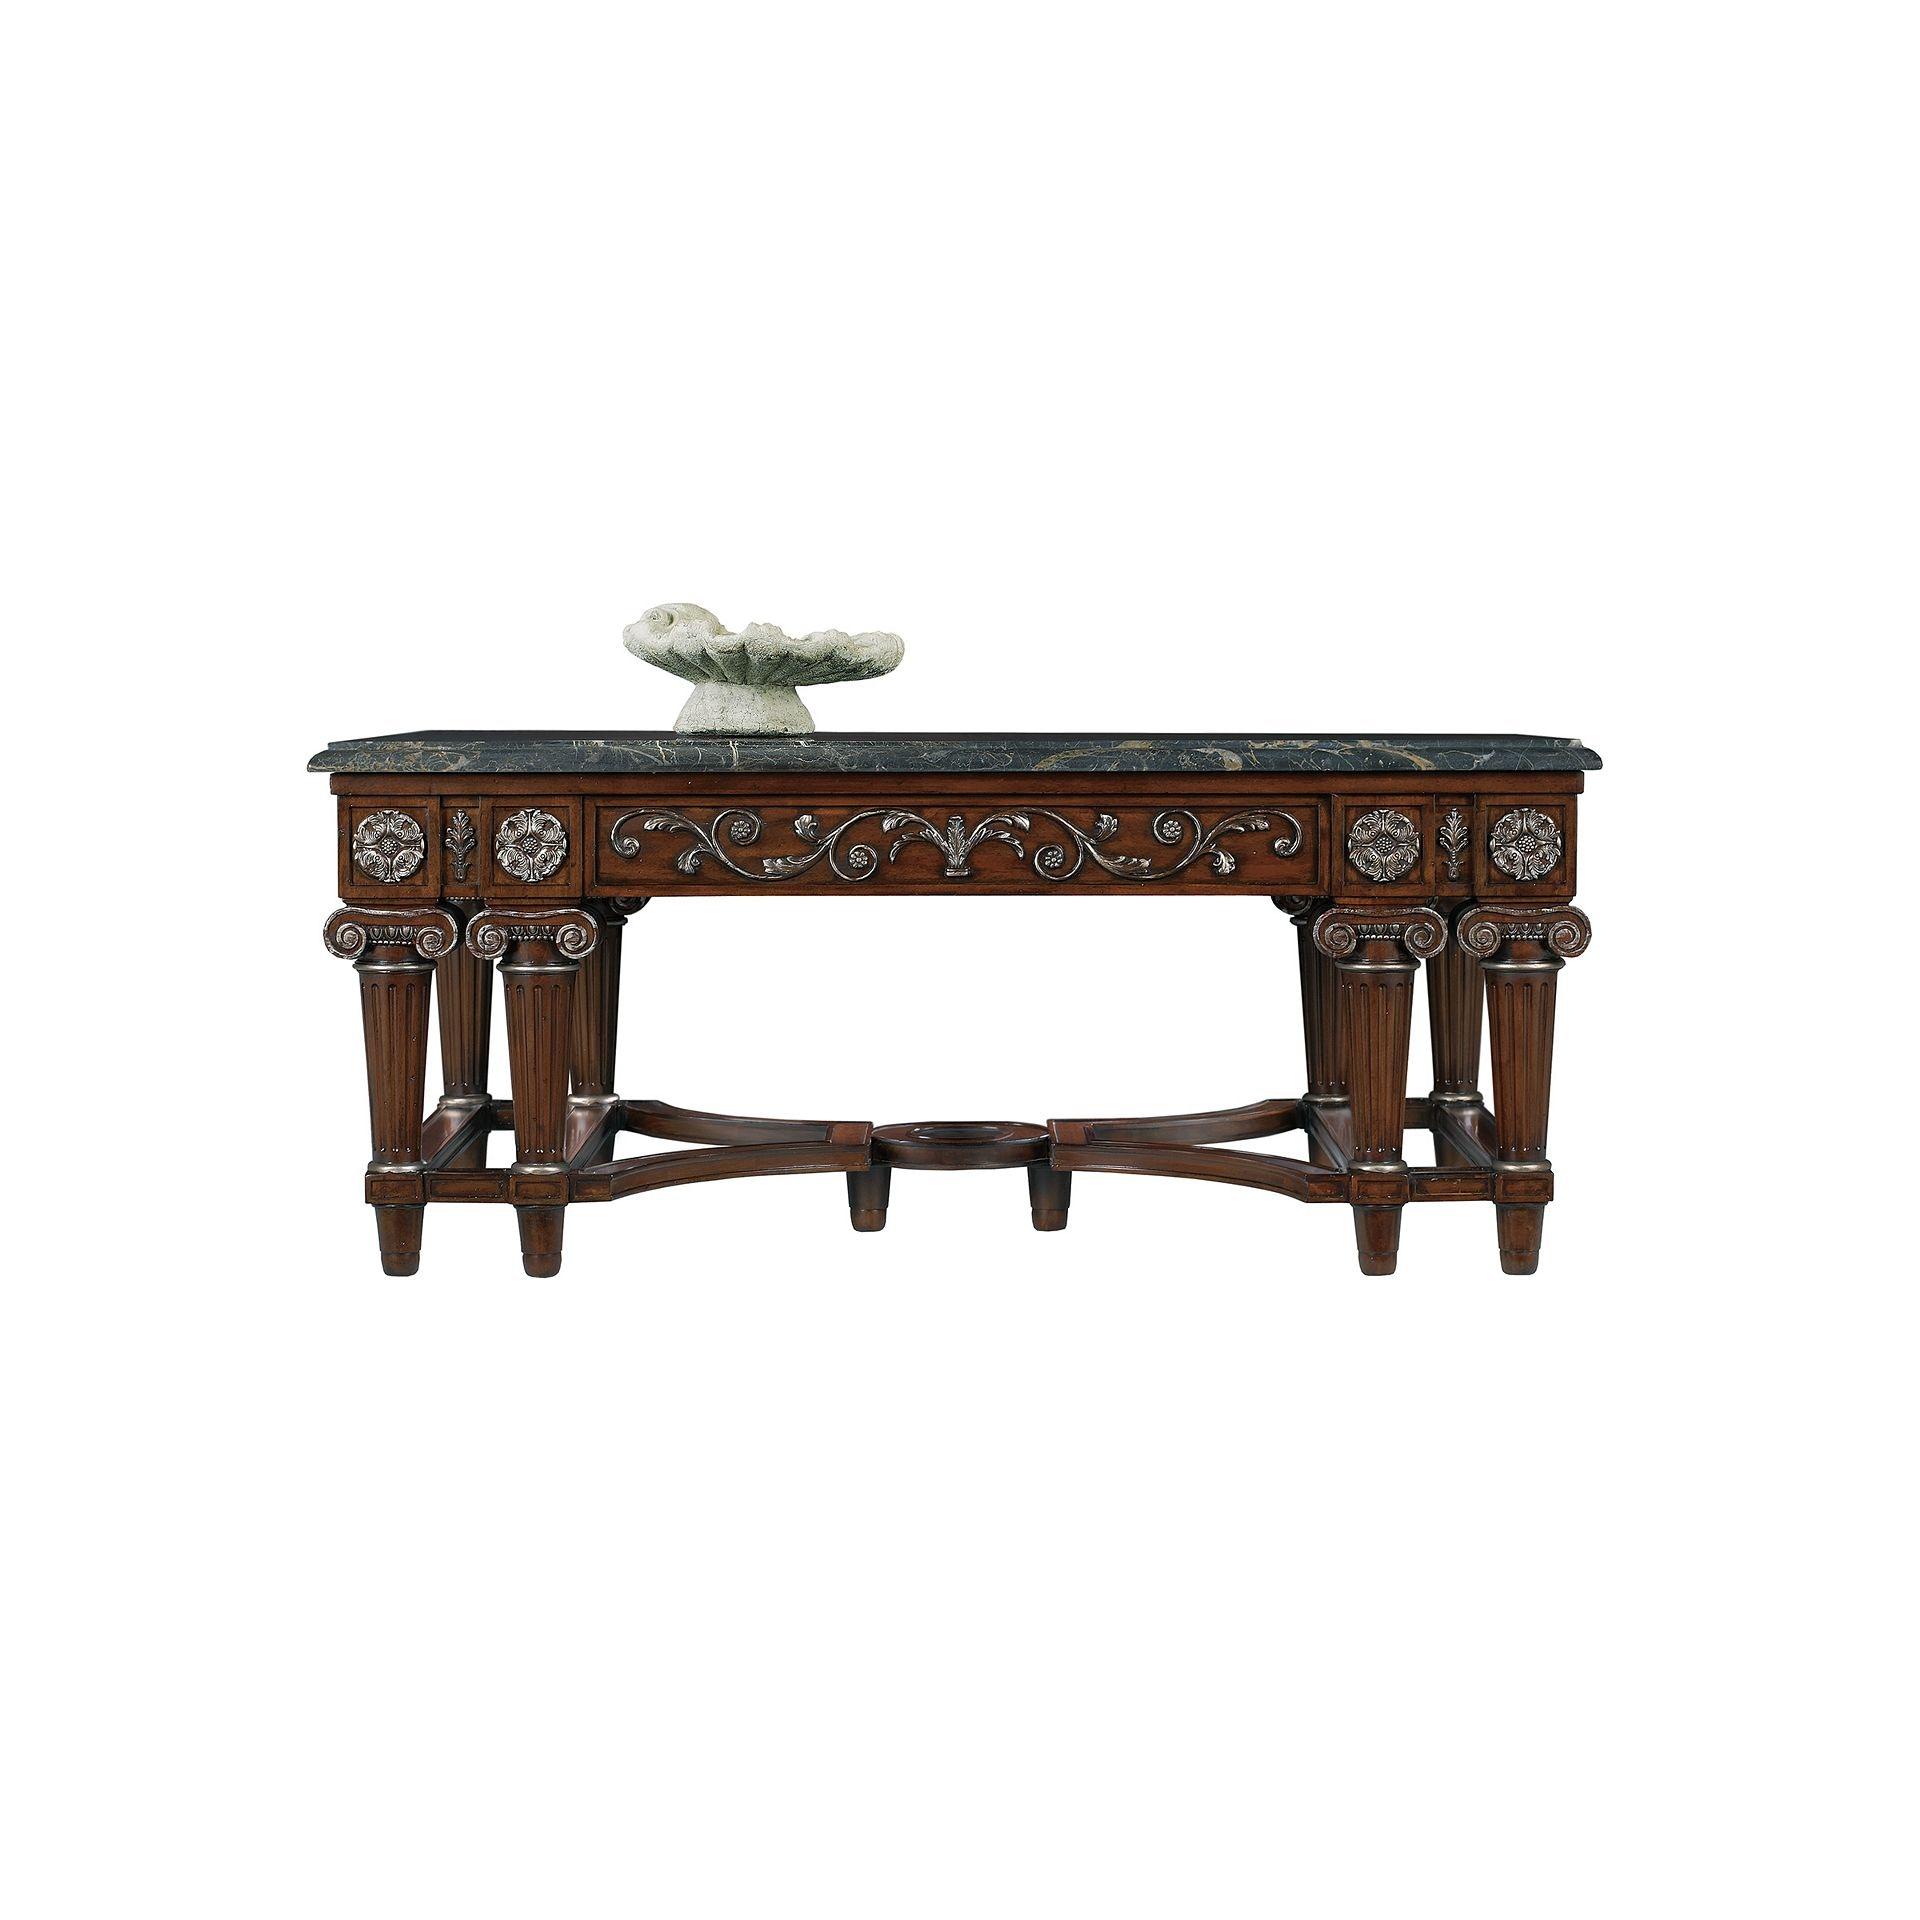 Henredon Furniture Marseilles II Cocktail Table, Marble Top 5041 40B U0026  5041 40M